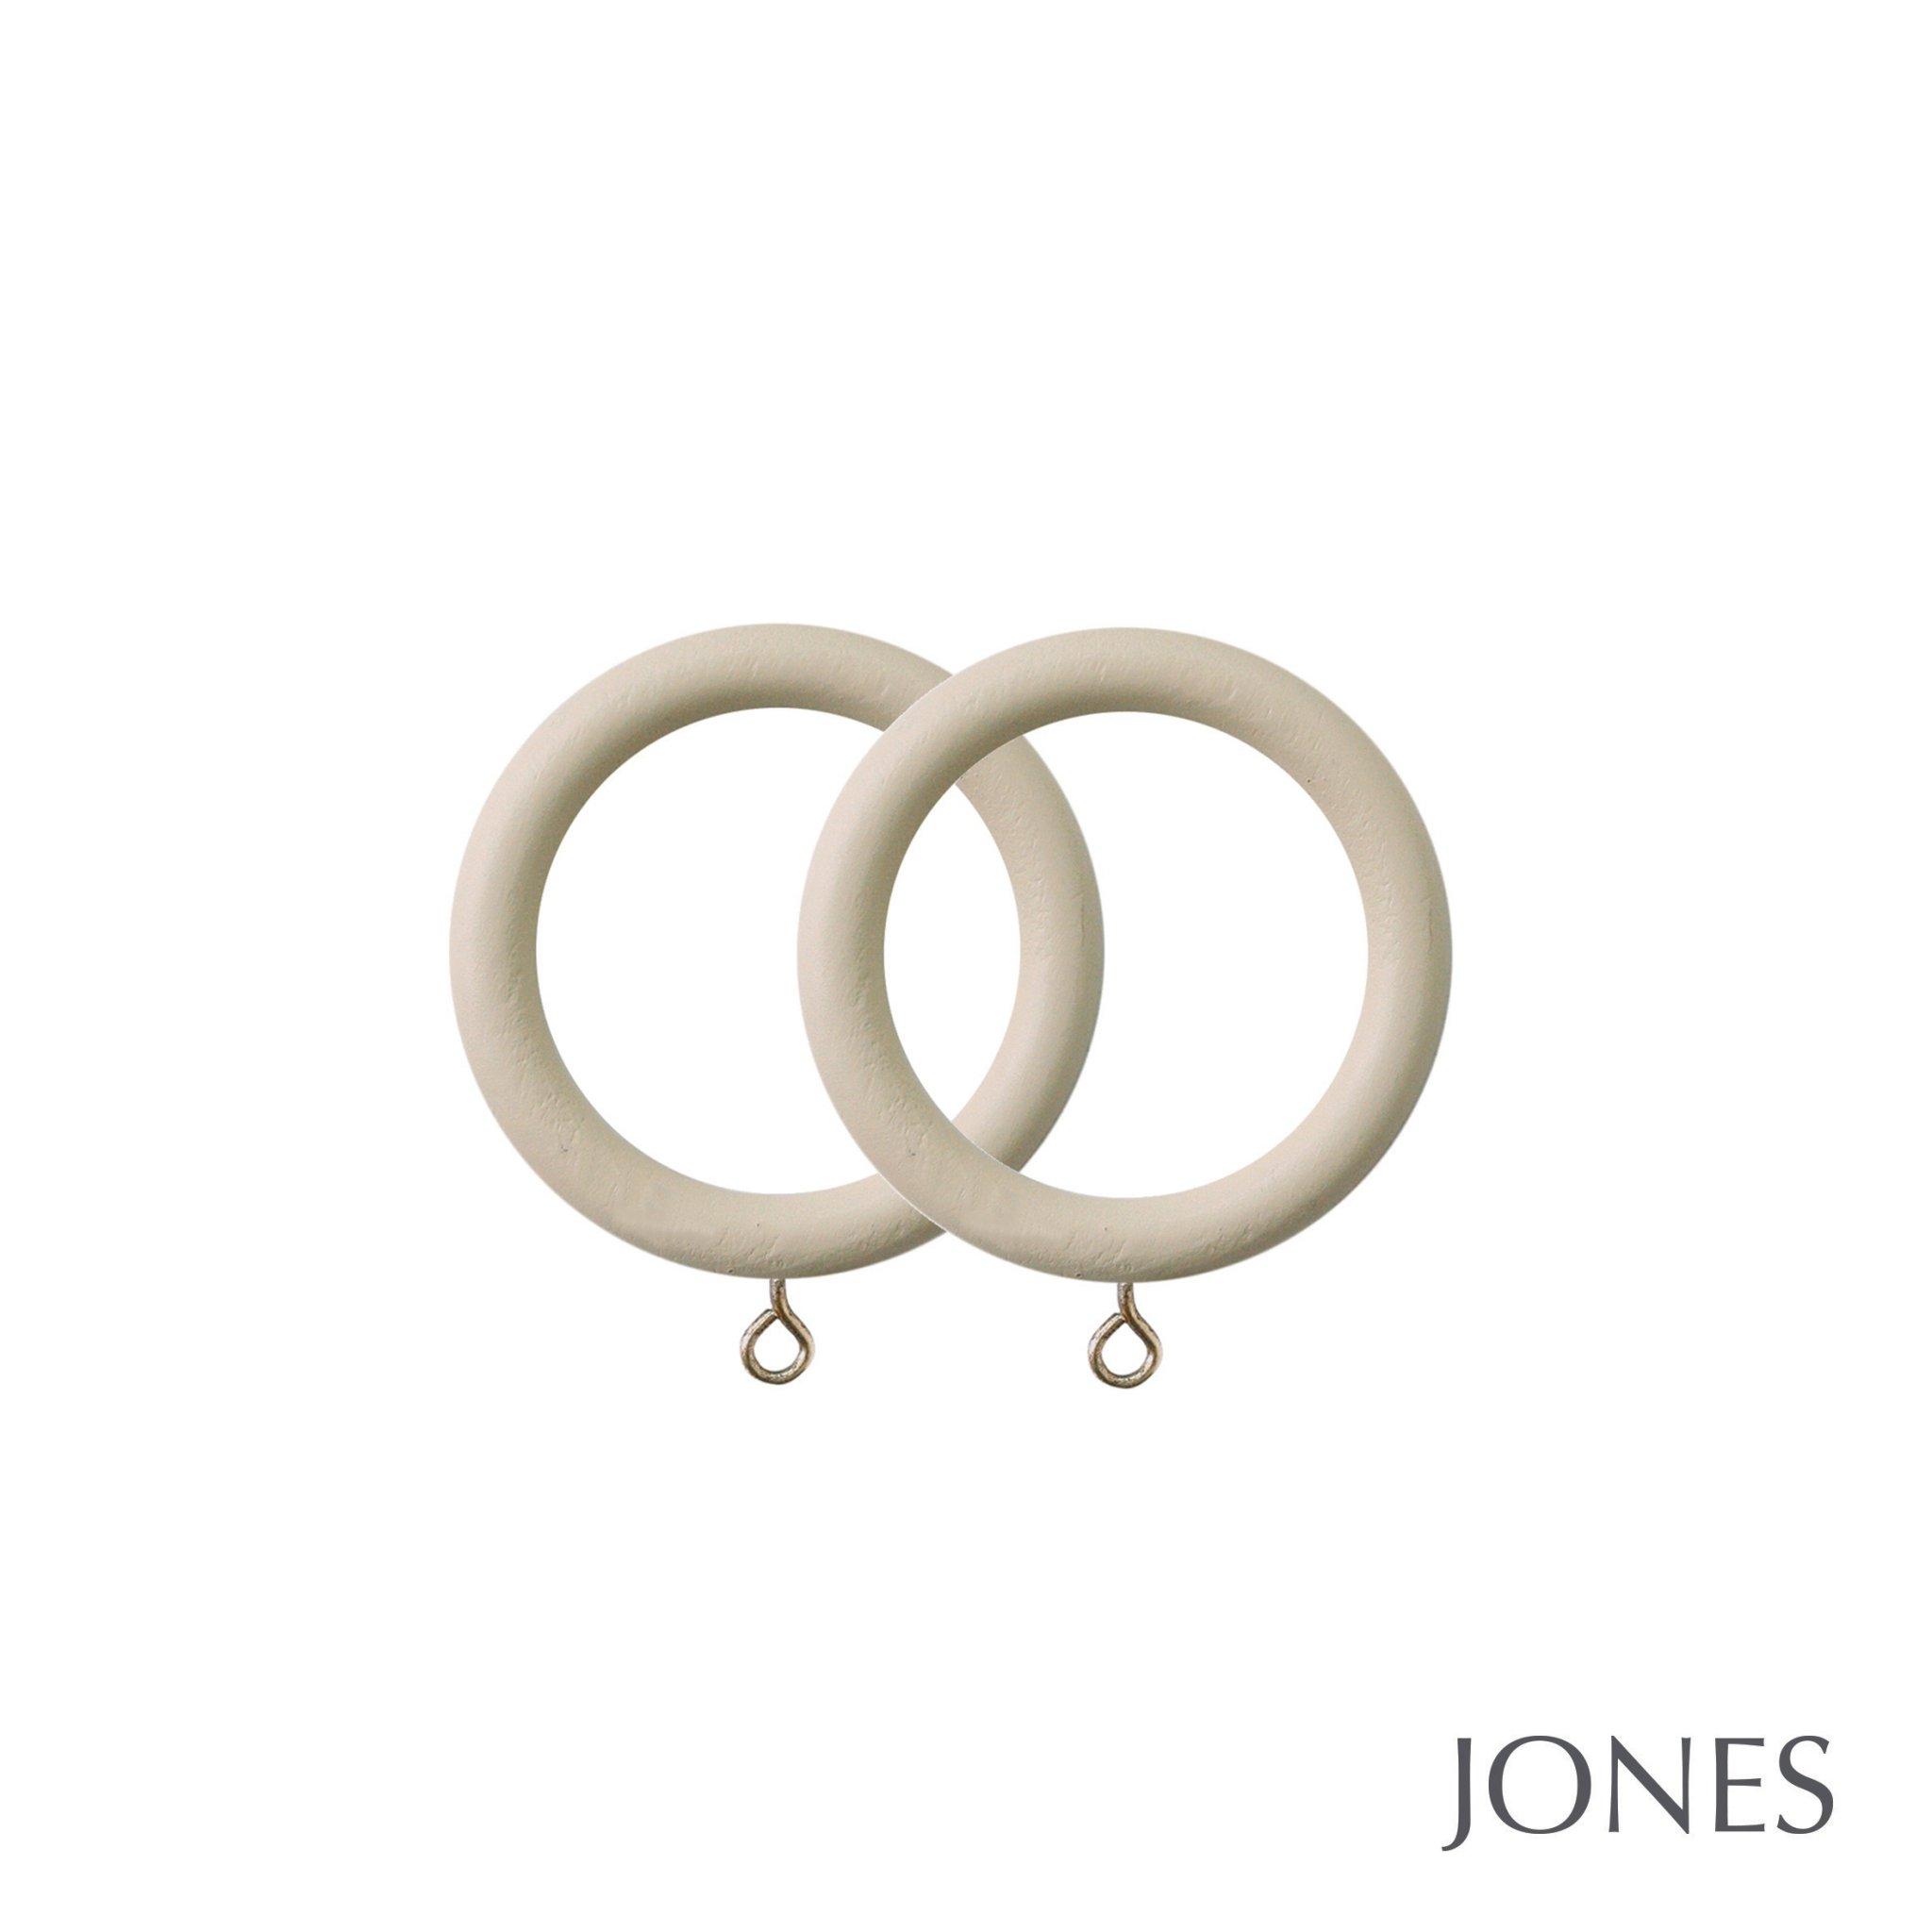 Jones Seychelles Handcrafted 40mm Curtain Rings